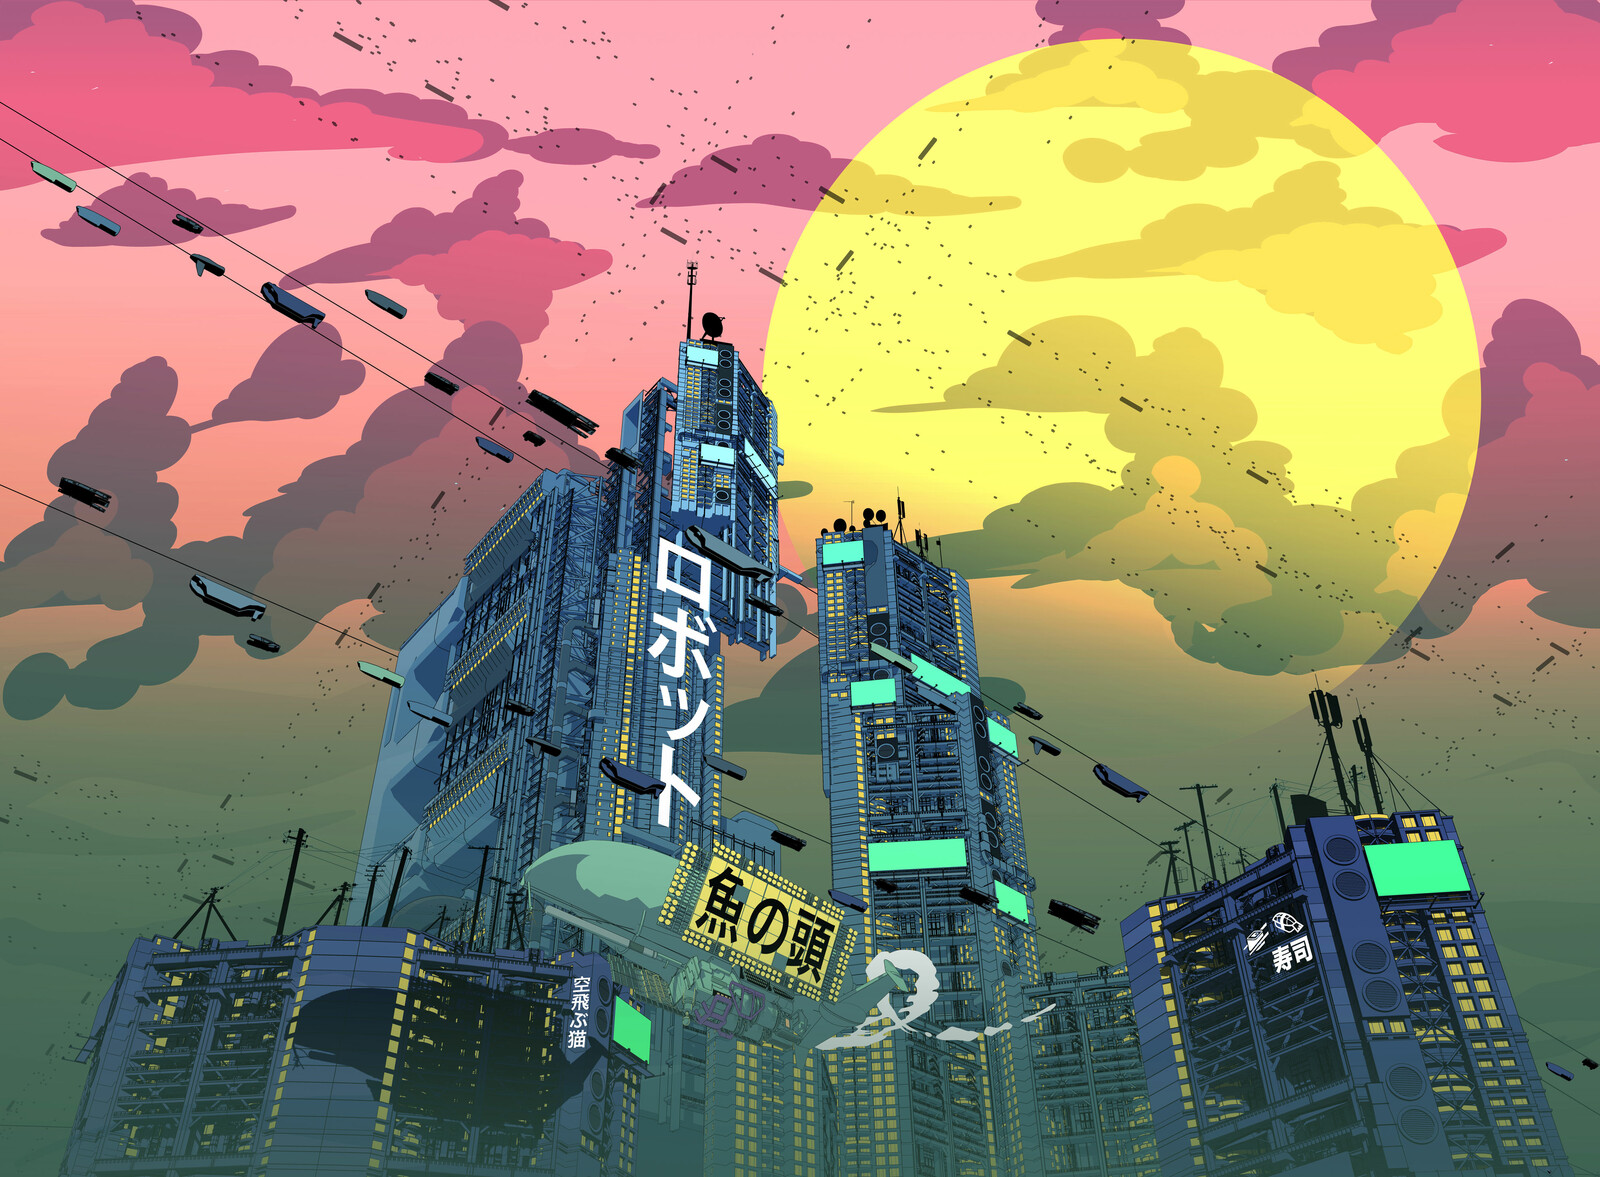 Cyber City 101